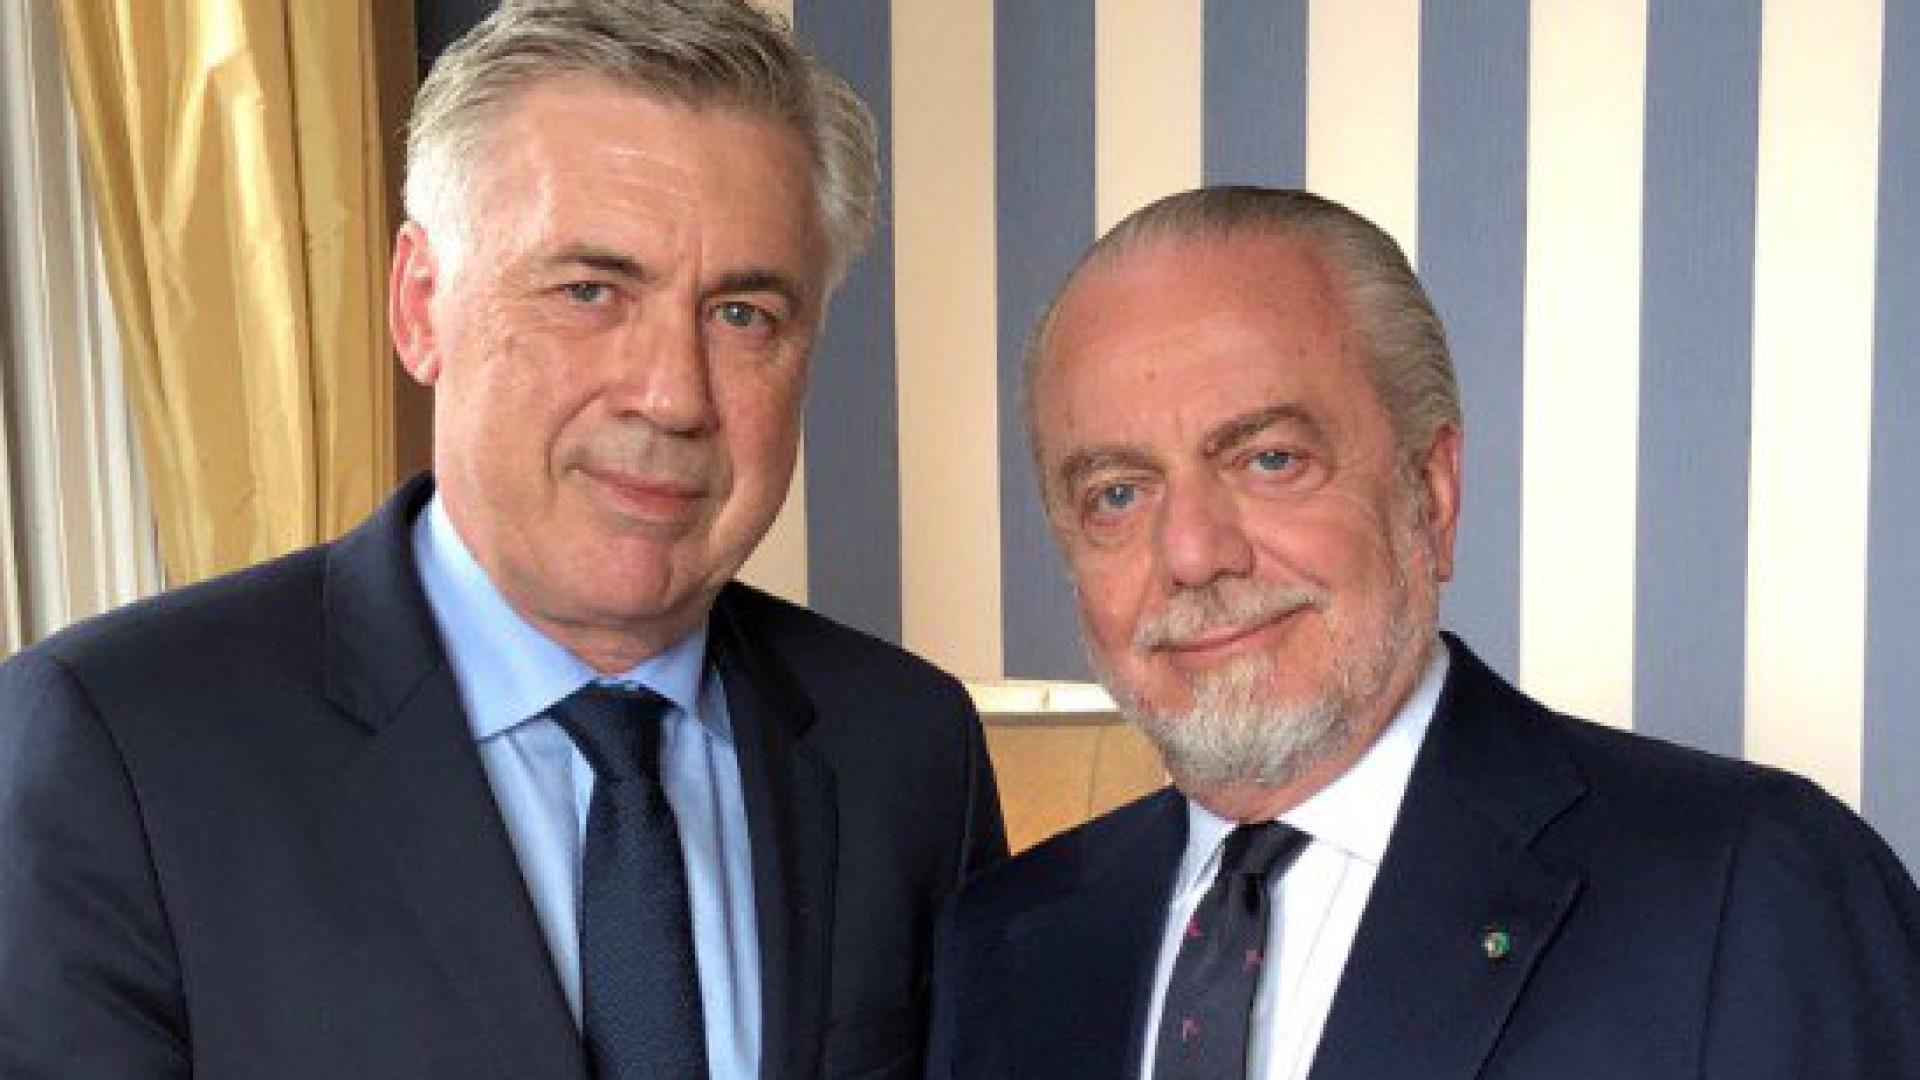 Oficial: Ancelotti assume comando técnico do Nápoles